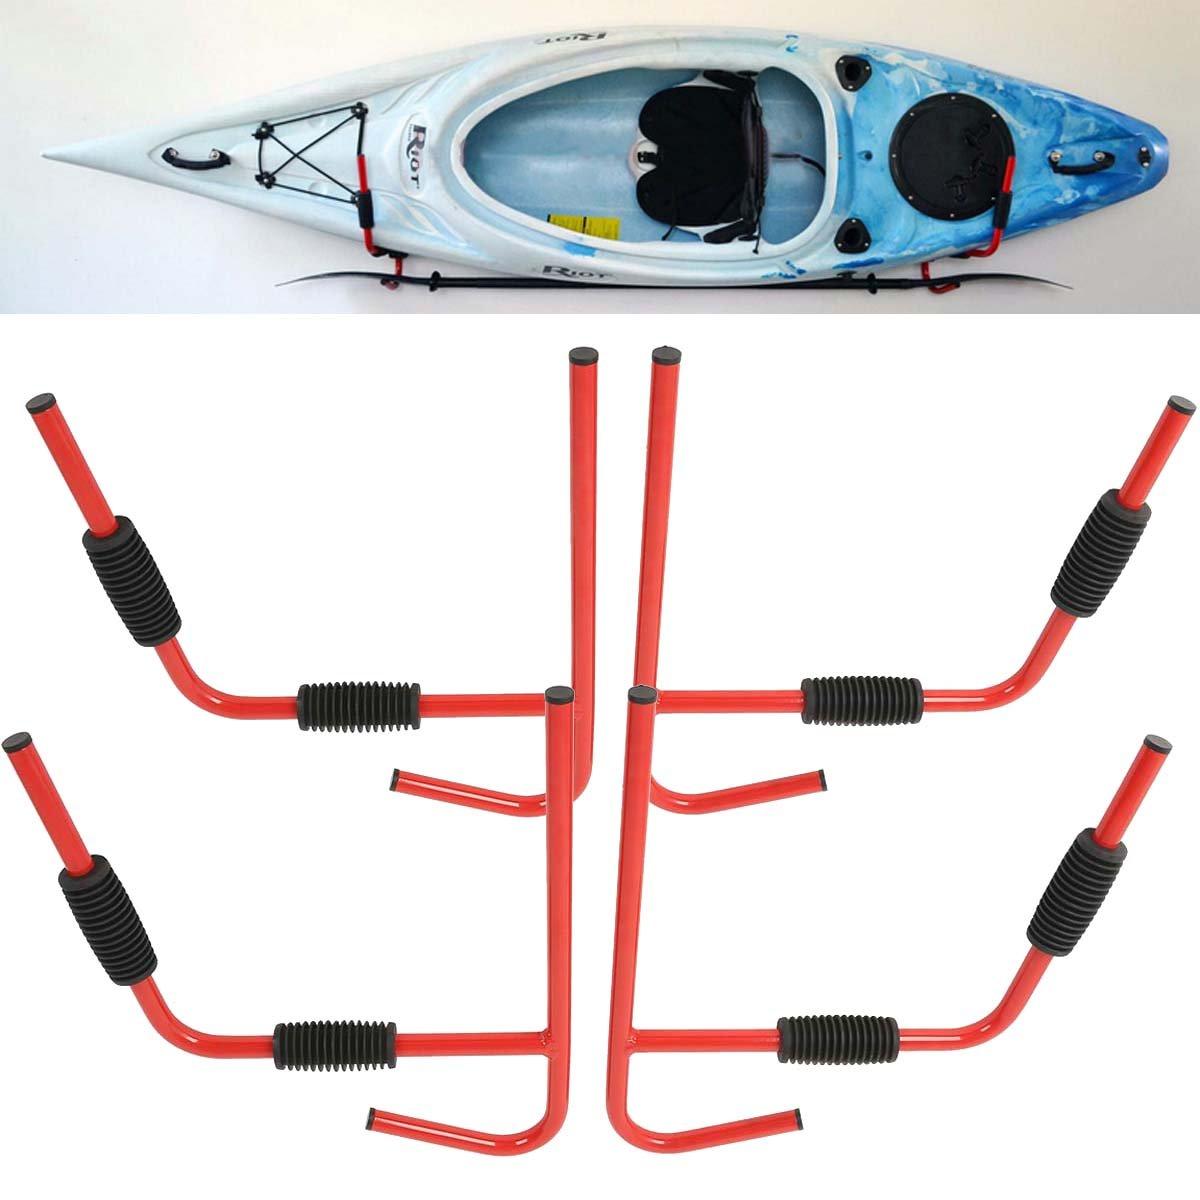 Tengchang 2 Pair Wall Mount Kayak Storage Rack Surfboard Steel Ladder Canoe Folding Hanger by Tengchang